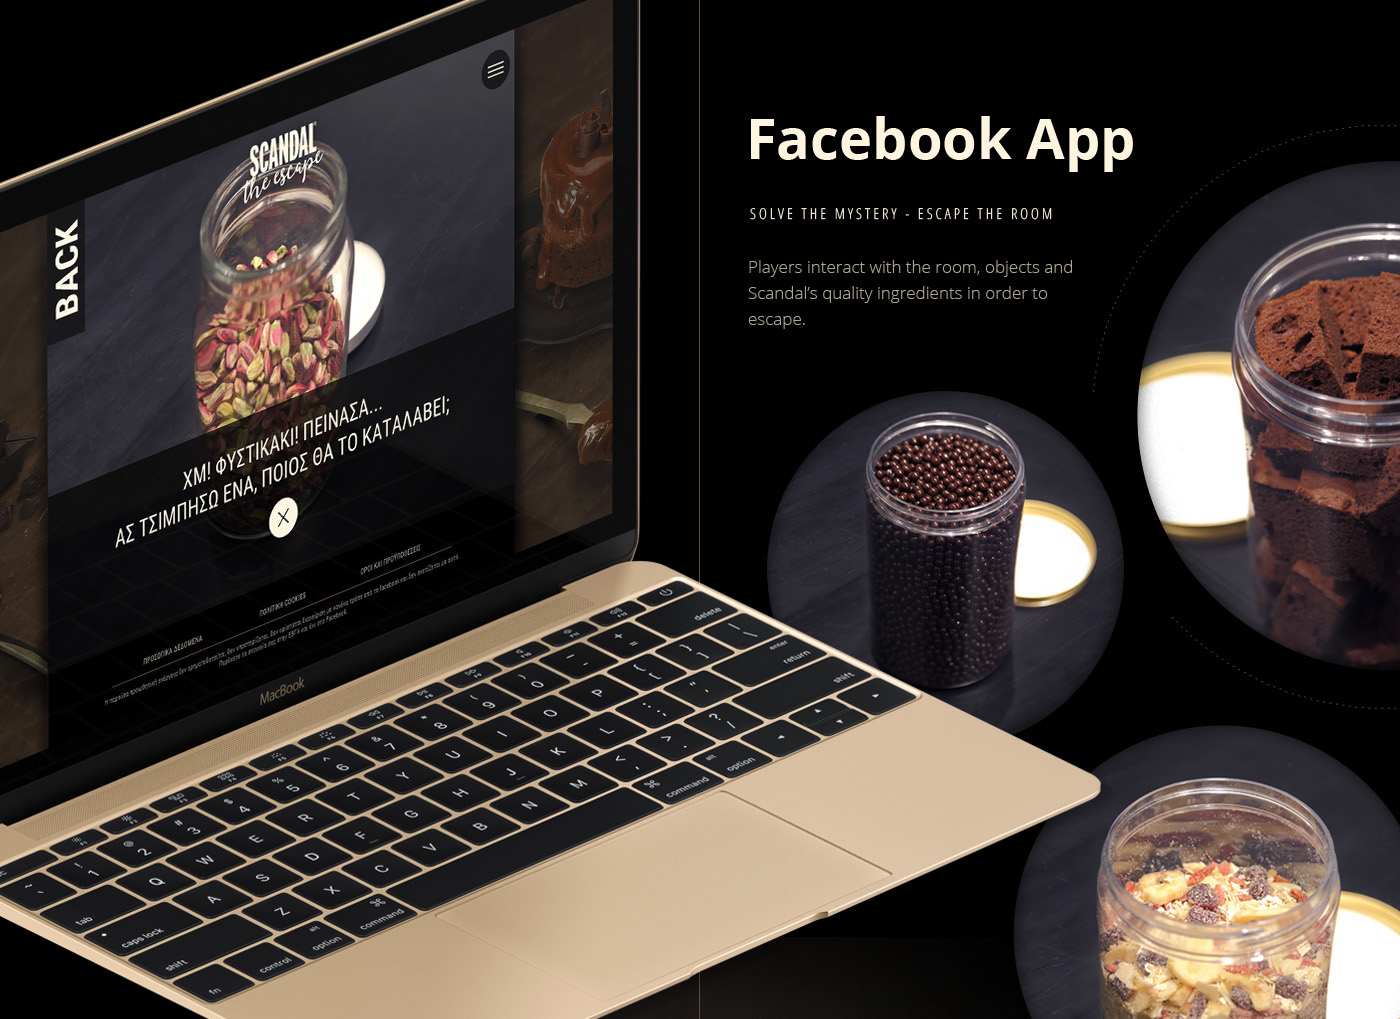 facebook app for macbook